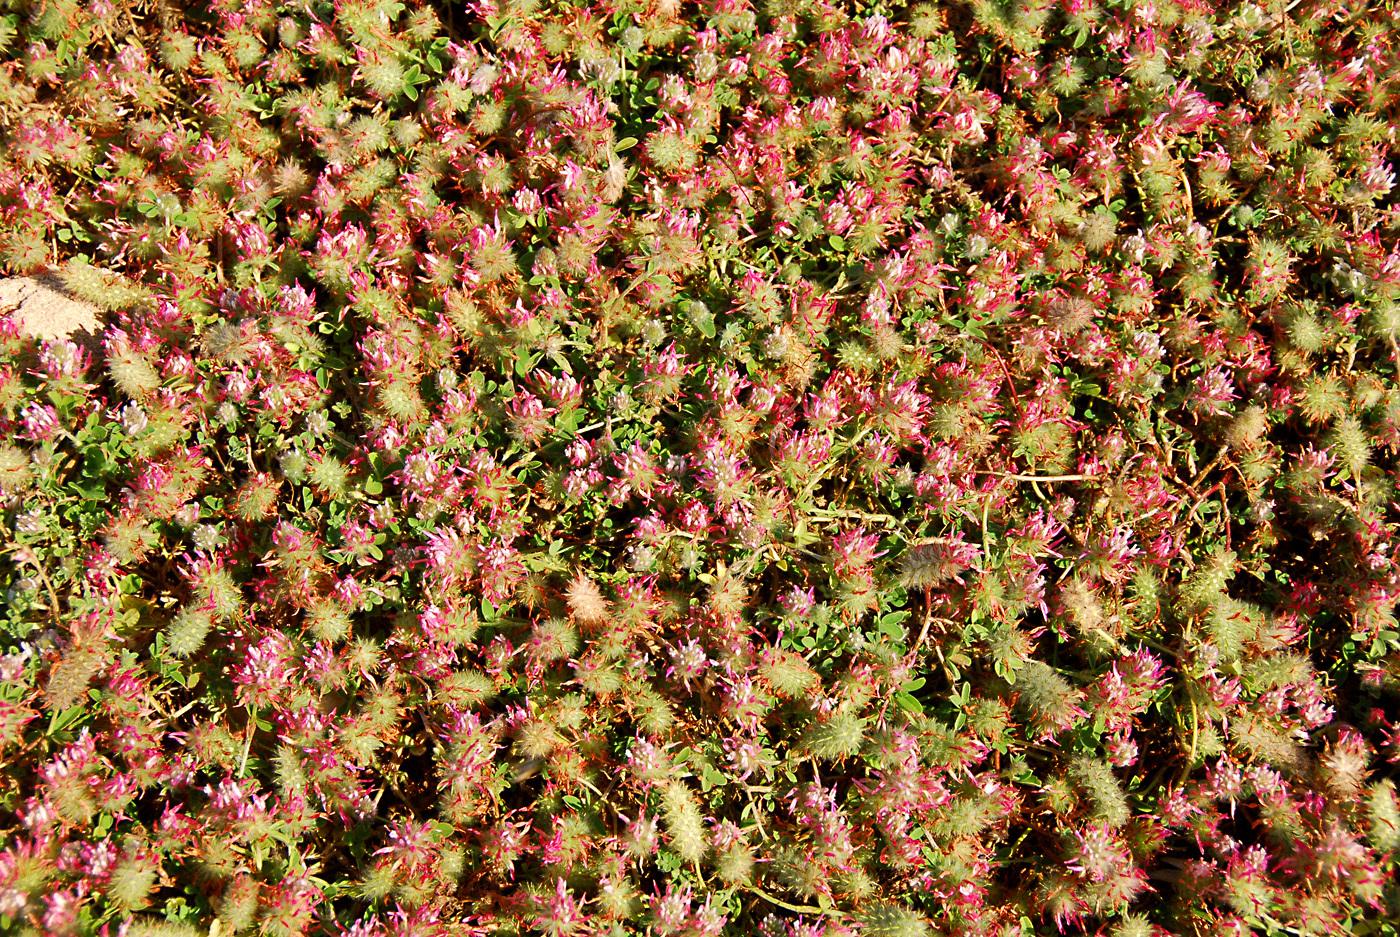 https://pictures.bgbm.org/digilib/Scaler?fn=Cyprus/Trifolium_pamphylicum_B1.jpg&mo=file